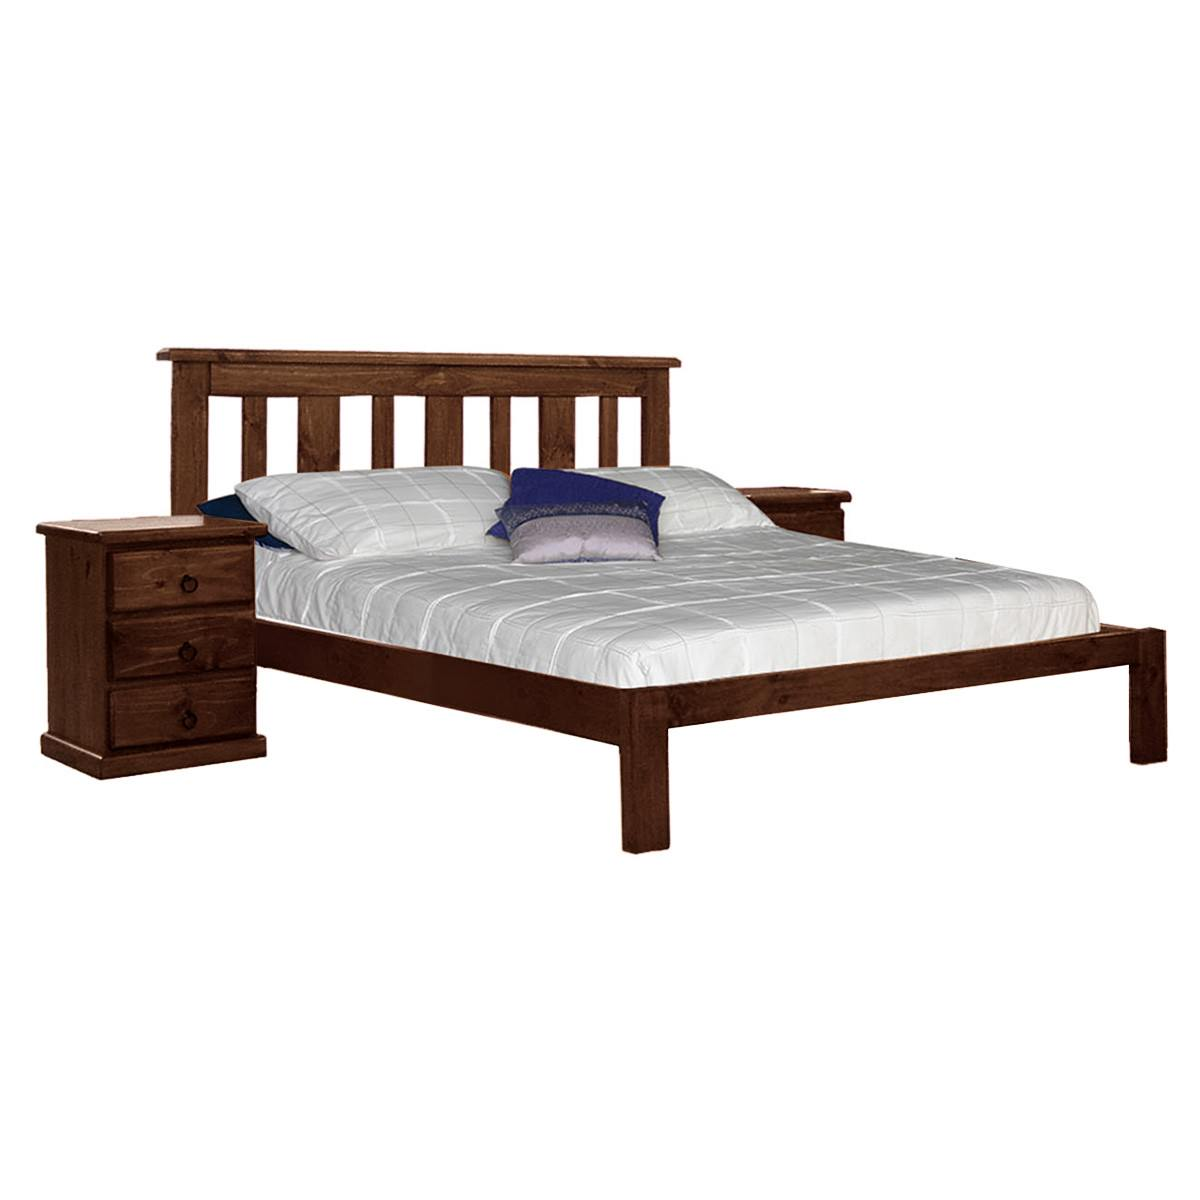 Gina New Zealand Pine Timber Bed, Single, Walnut